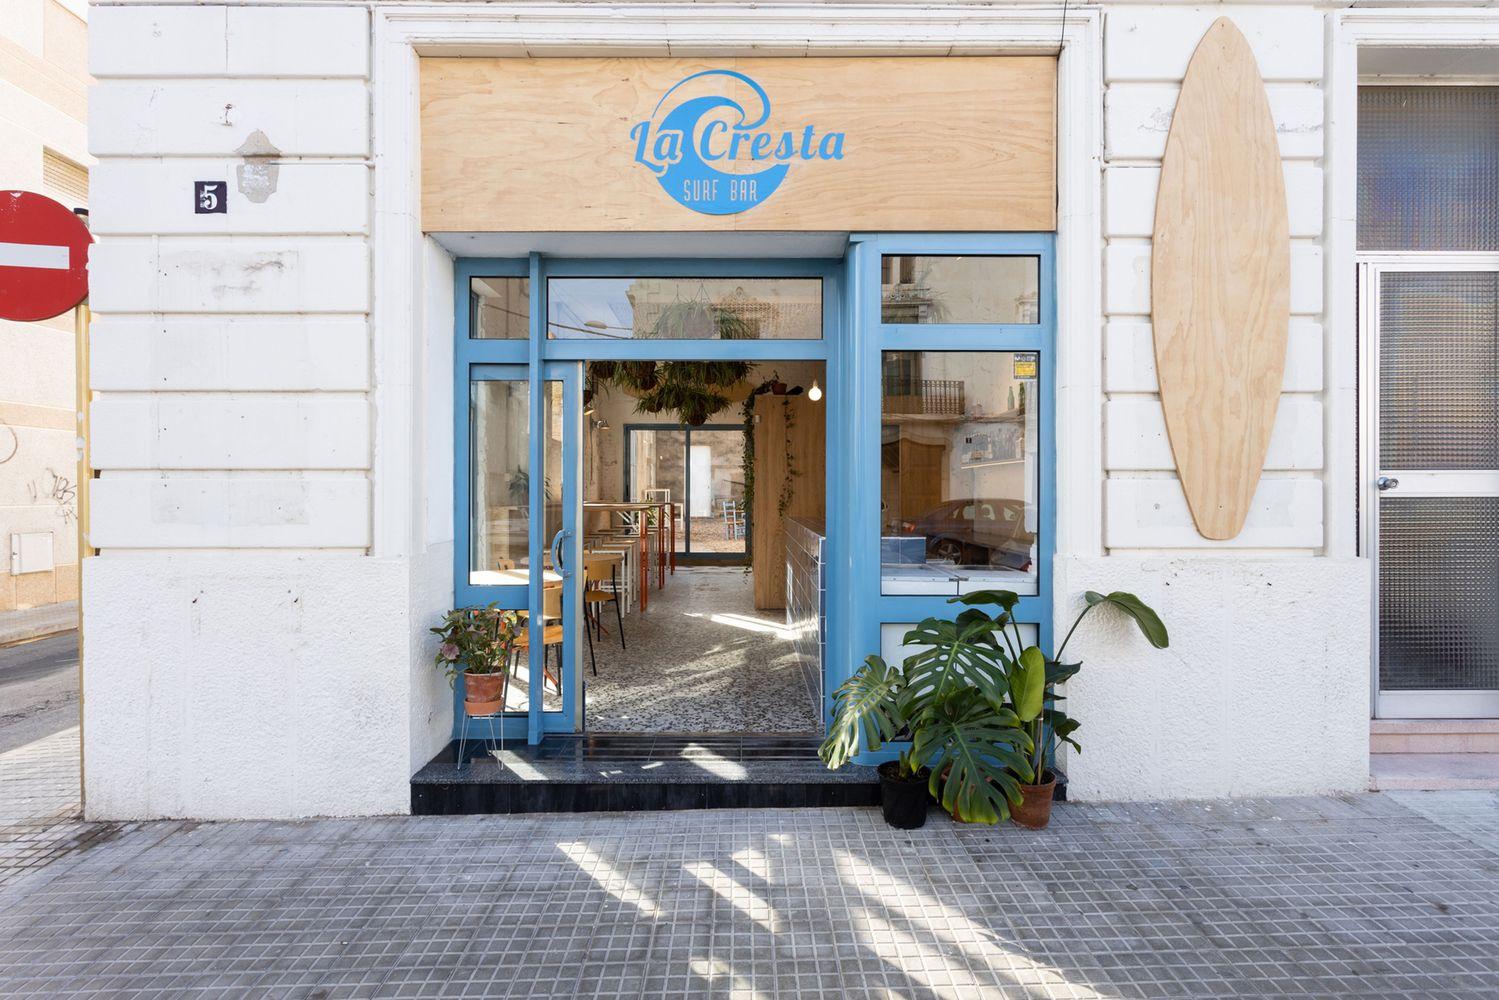 La Cresta Surf Bar Arjub Studio 01